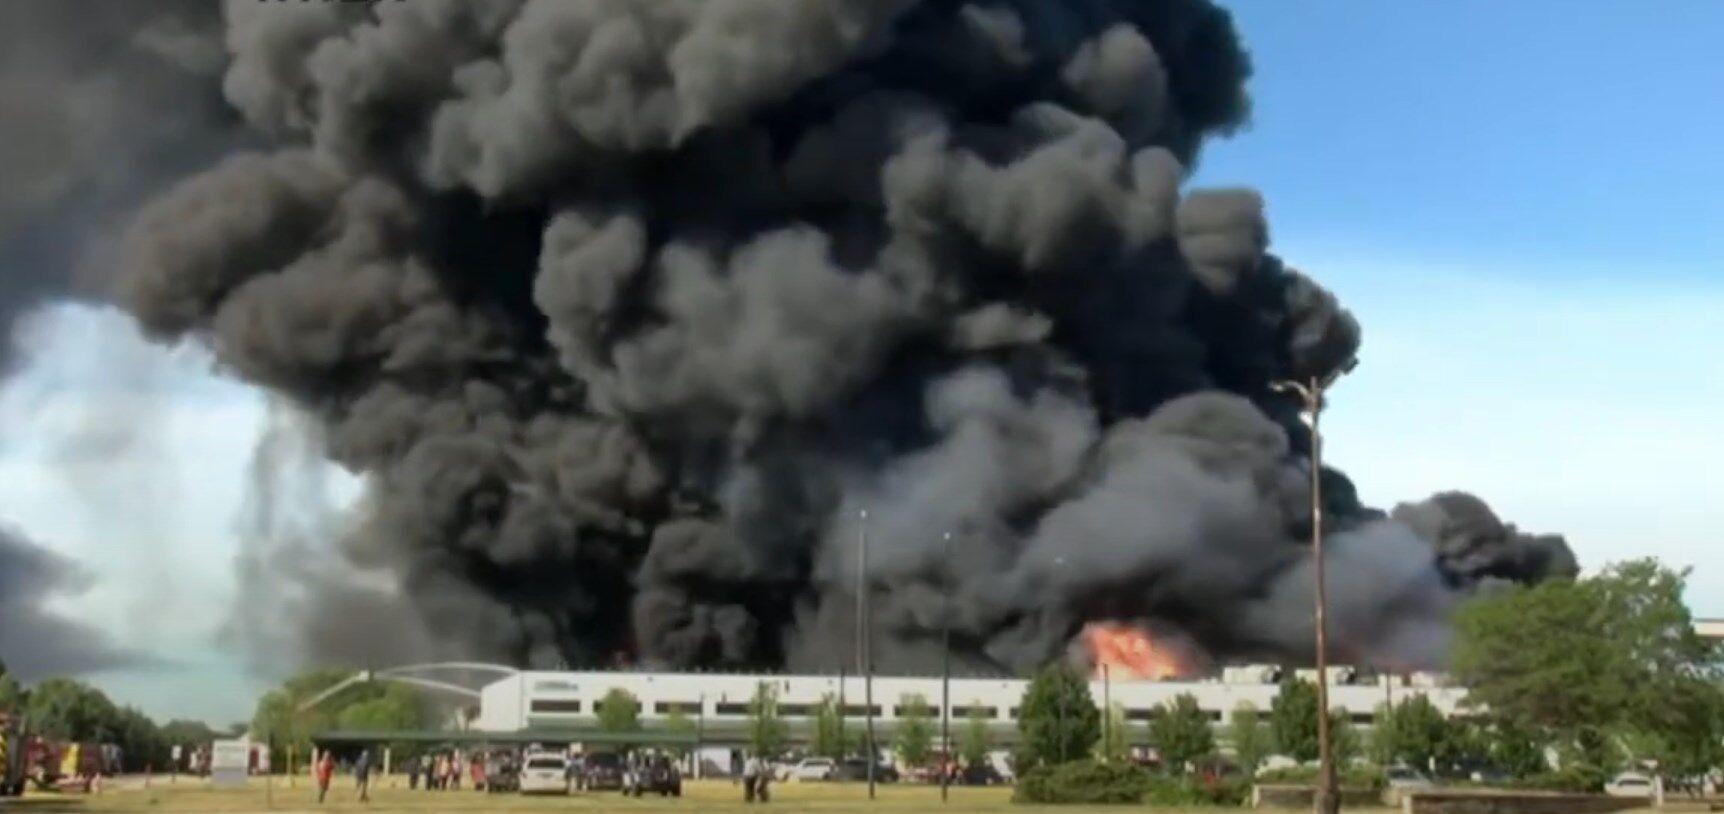 Над заводом поднимался столб густого дыма.